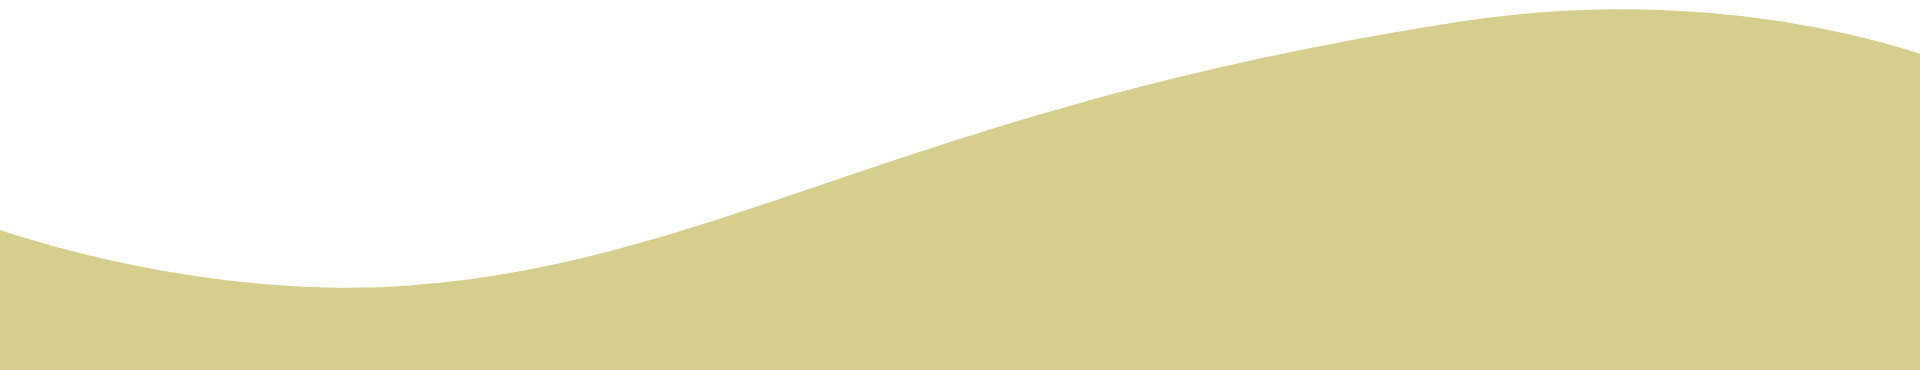 one-month-bgr-yellow